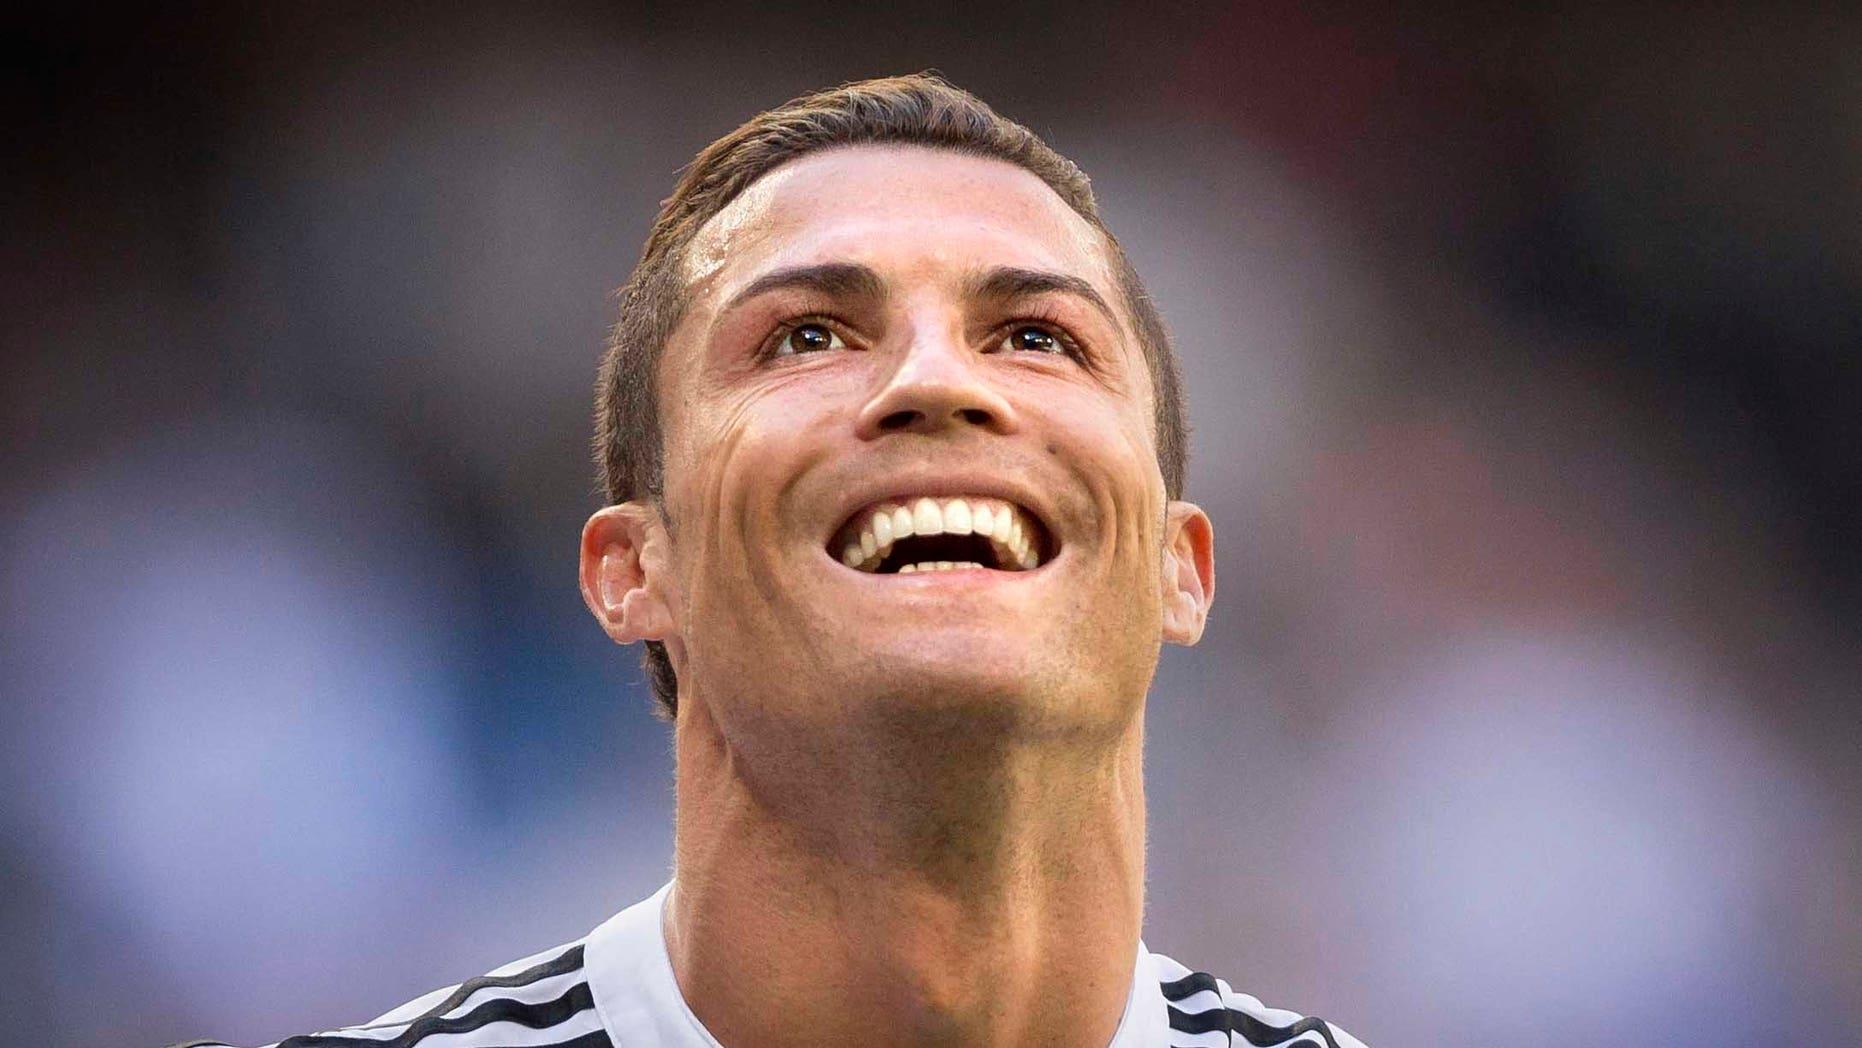 Real Madrid's Cristiano Ronaldo celebrates after scoring a goal during a La Liga soccer match between Real Madrid and Granada at the Santiago Bernabeu stadium in Madrid, Spain, Sunday, April 5, 2015. (AP Photo/Daniel Ochoa de Olza)